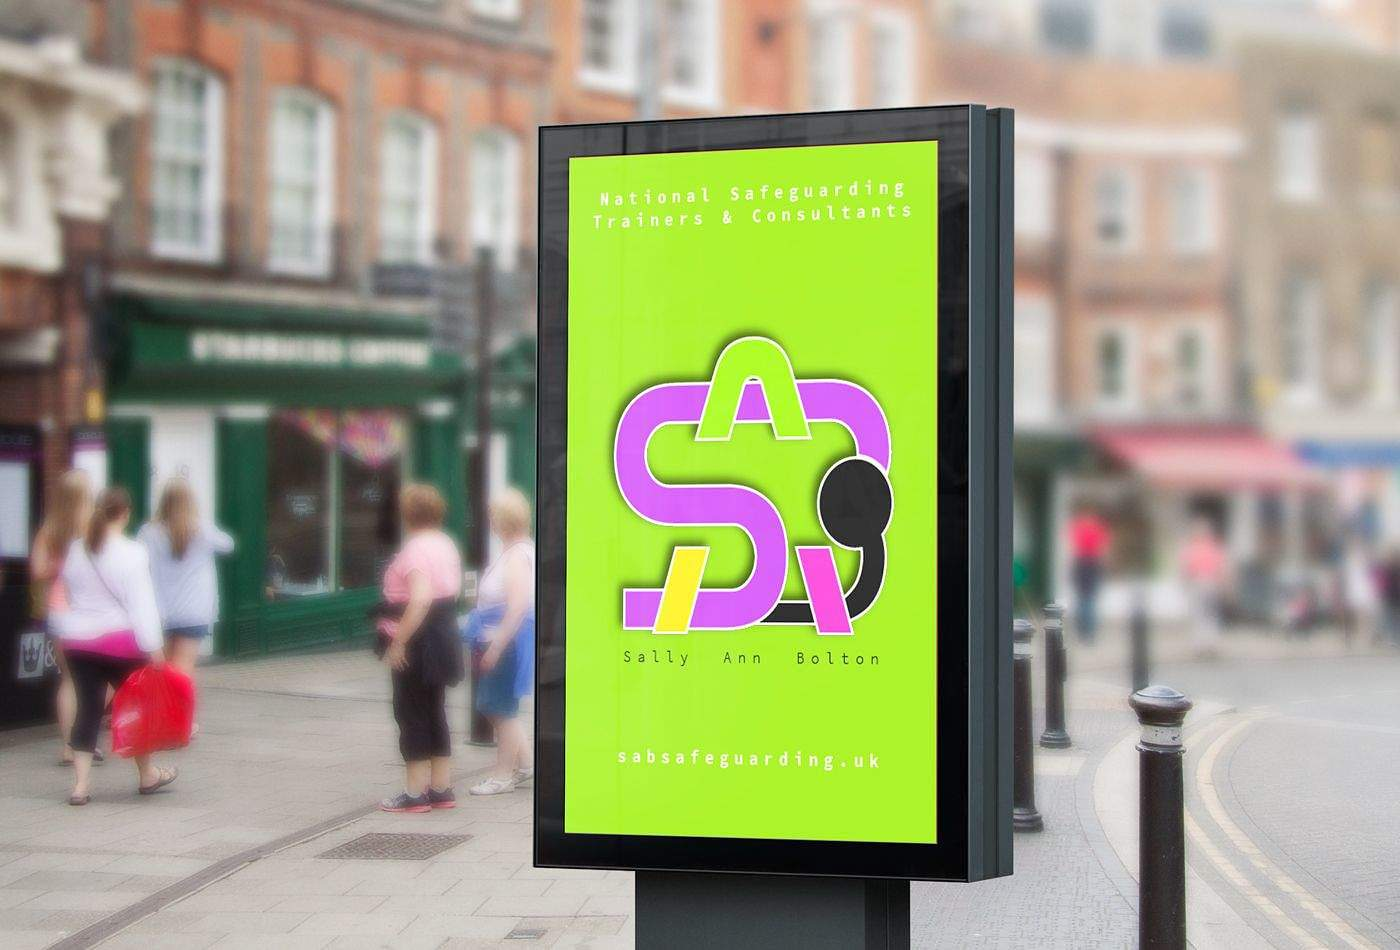 sab iconery street billboard - example of the icon design